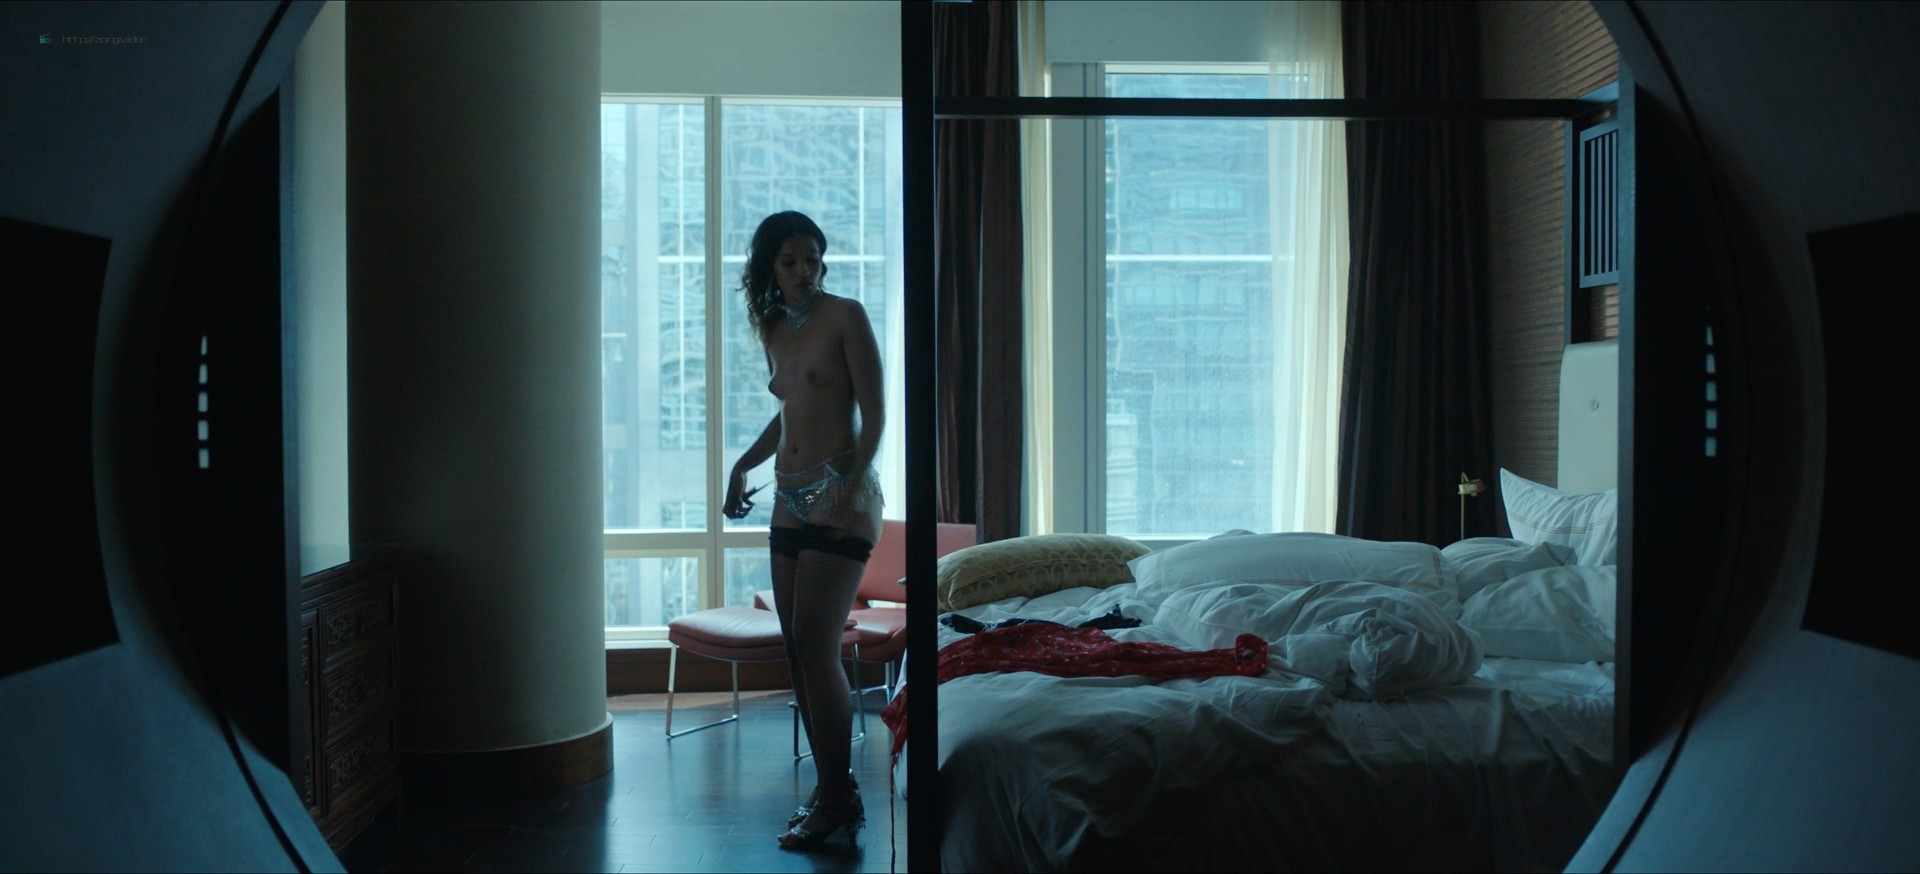 Jennifer Krukowski nude topless Devoshia Cooper nude too - Titans (2019) s2e7 1080p (4)